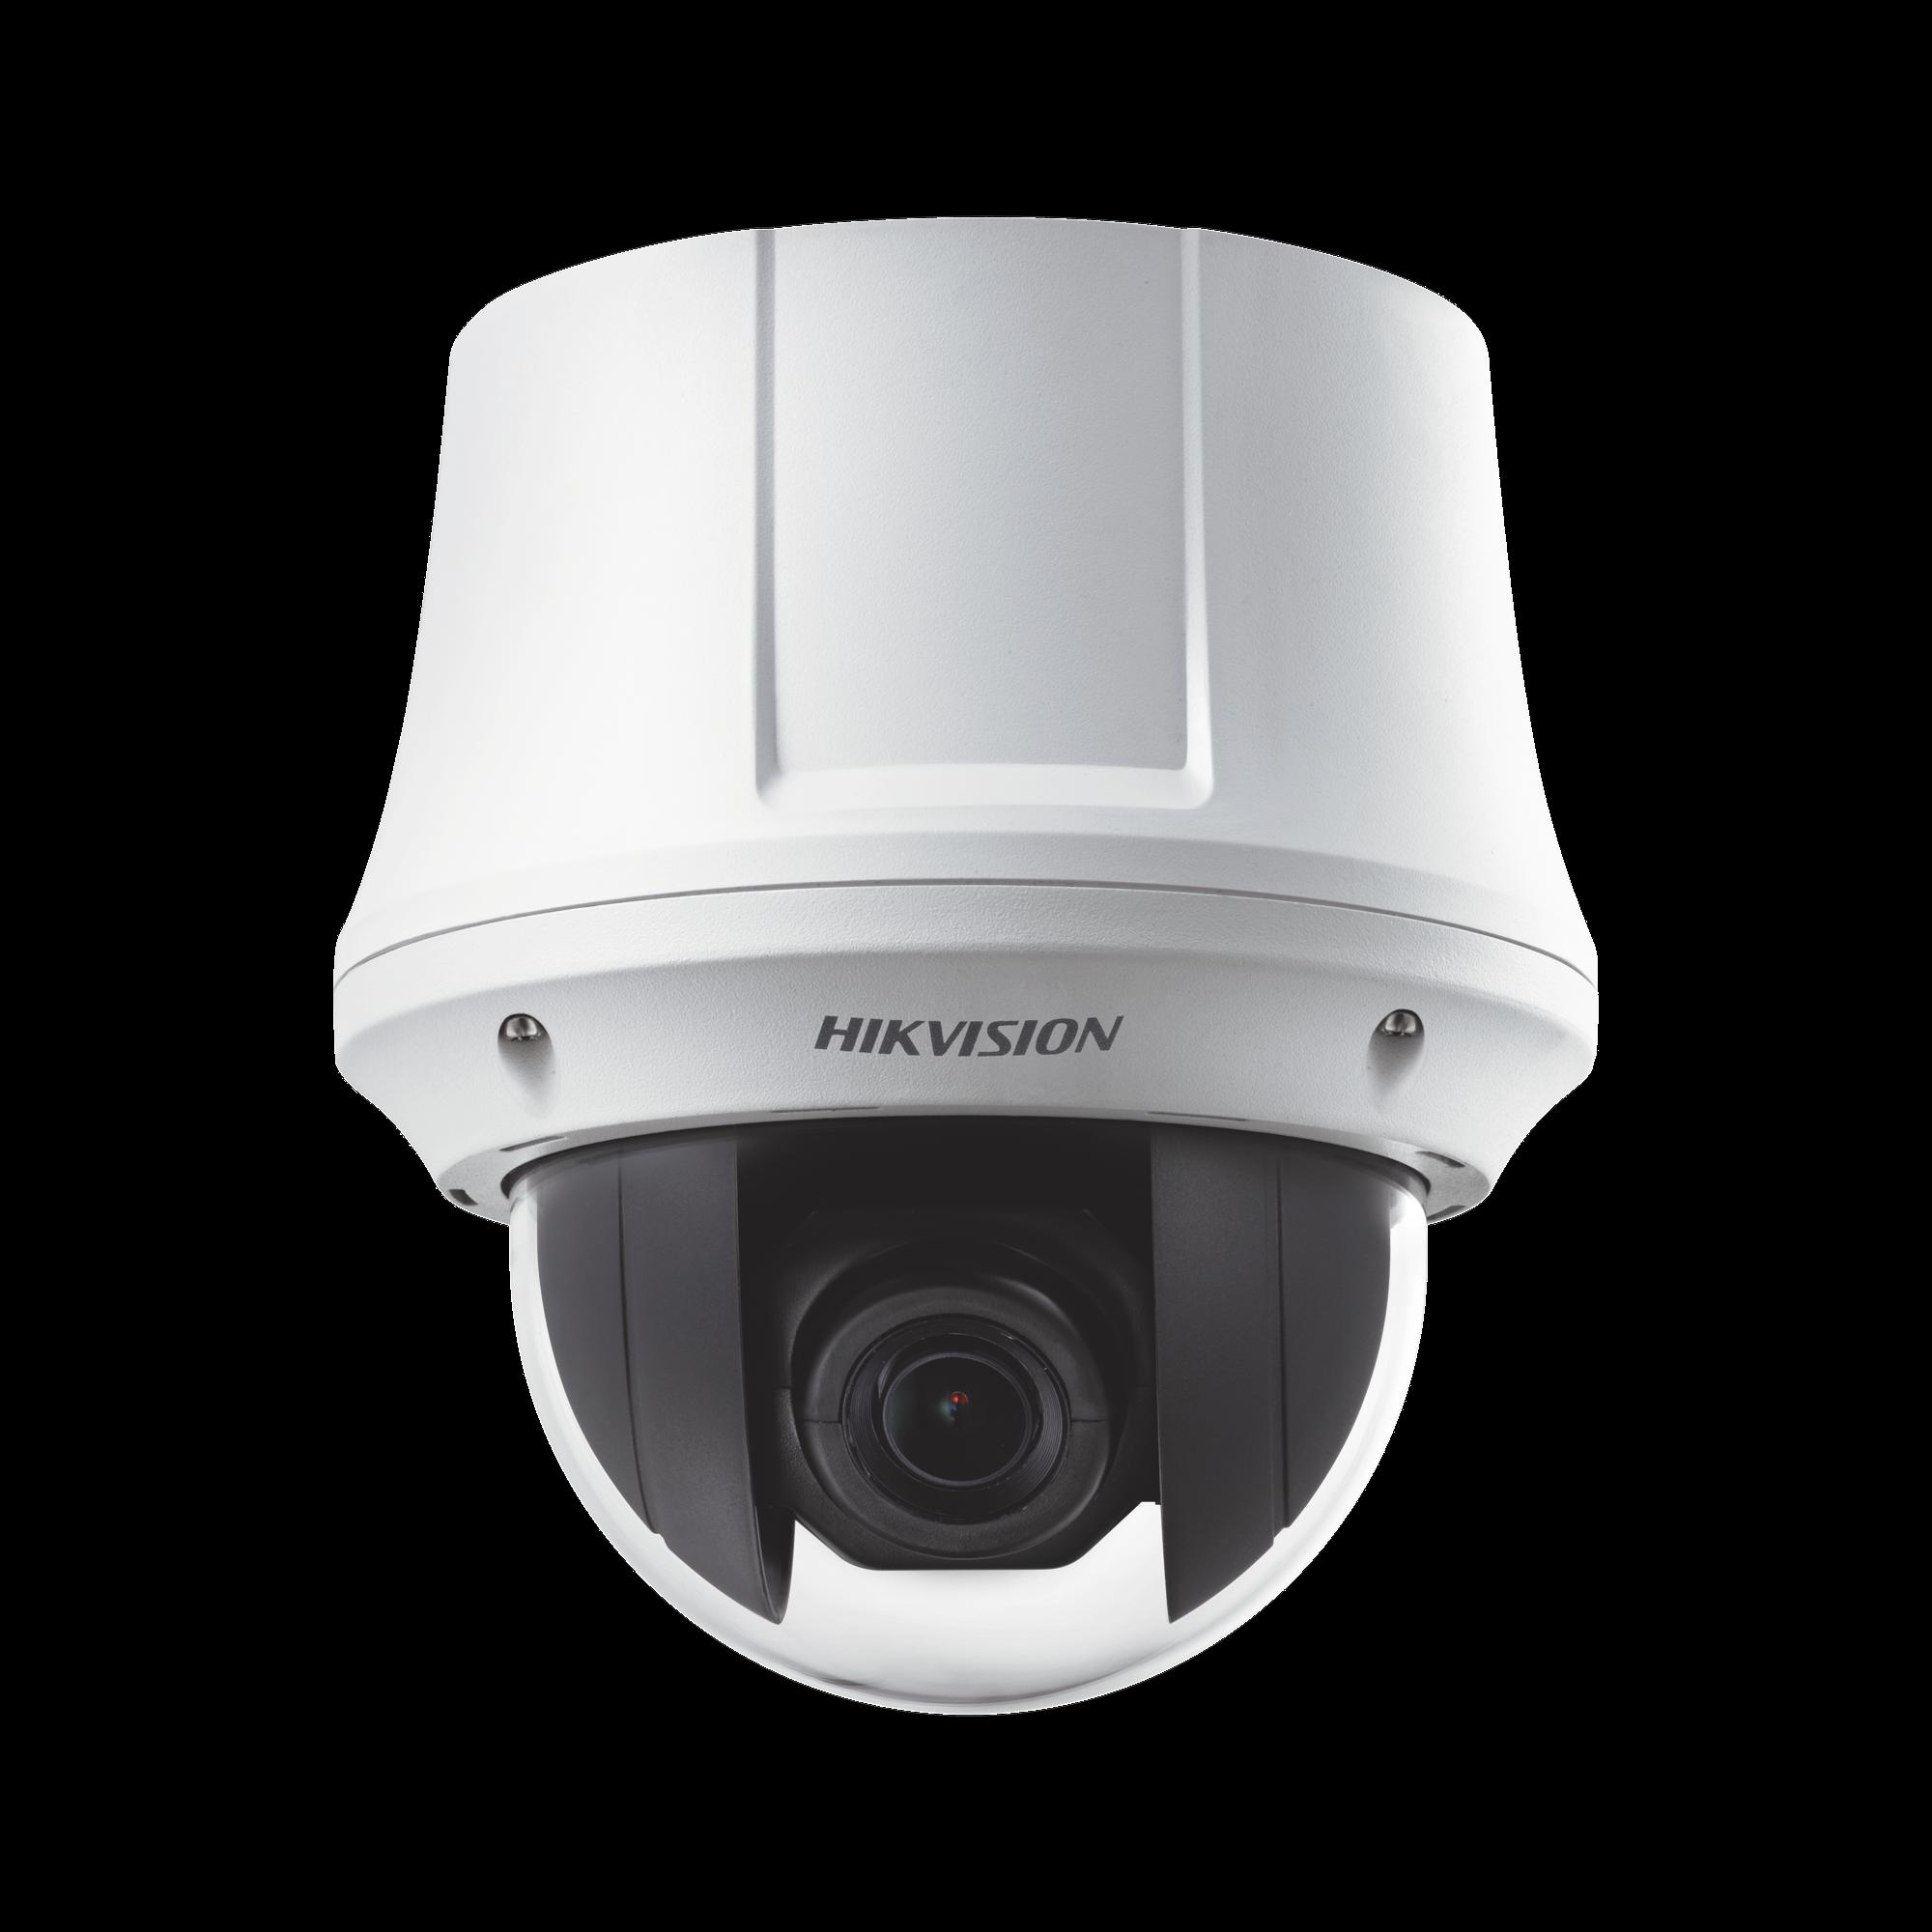 Domo PTZ TURBOHD 2 Megapixel / 15X Zoom / Uso en Plafon / Interior / RS-485 / WDR 120 dB / Ultra Baja Iluminación